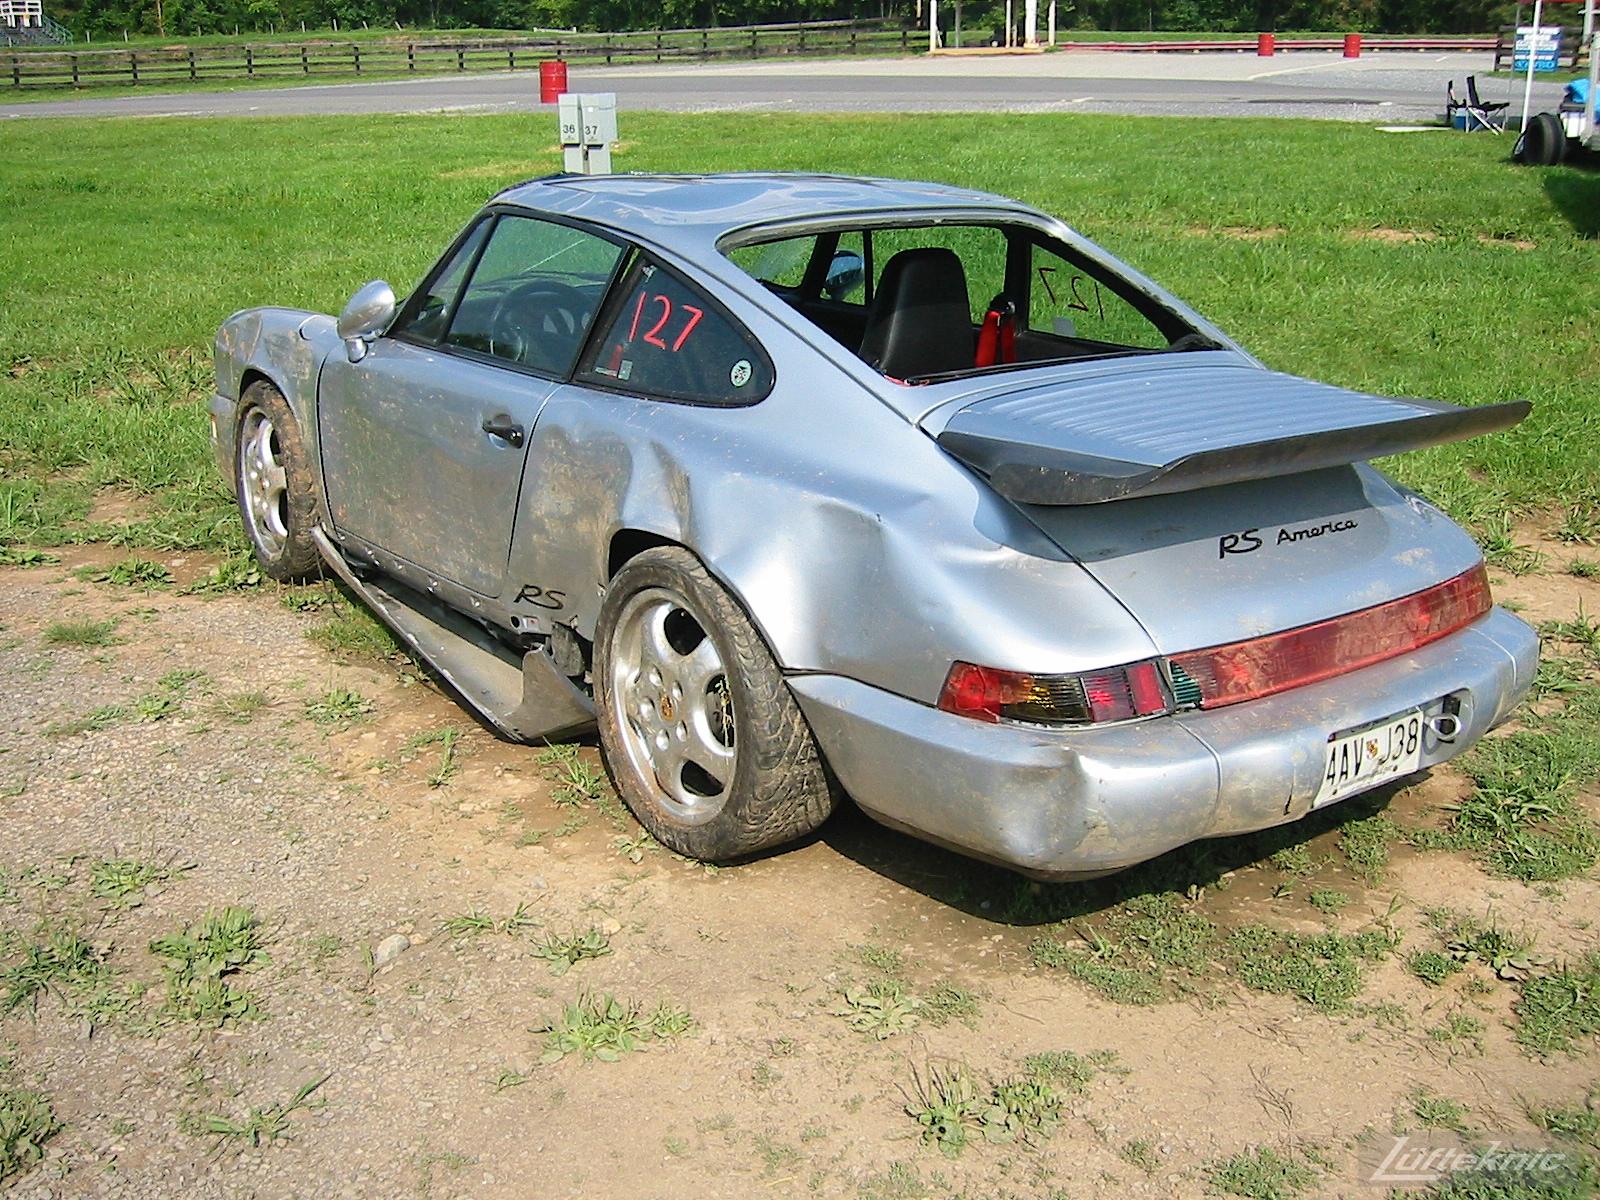 Freshly wrecked Porsche 964 RS America